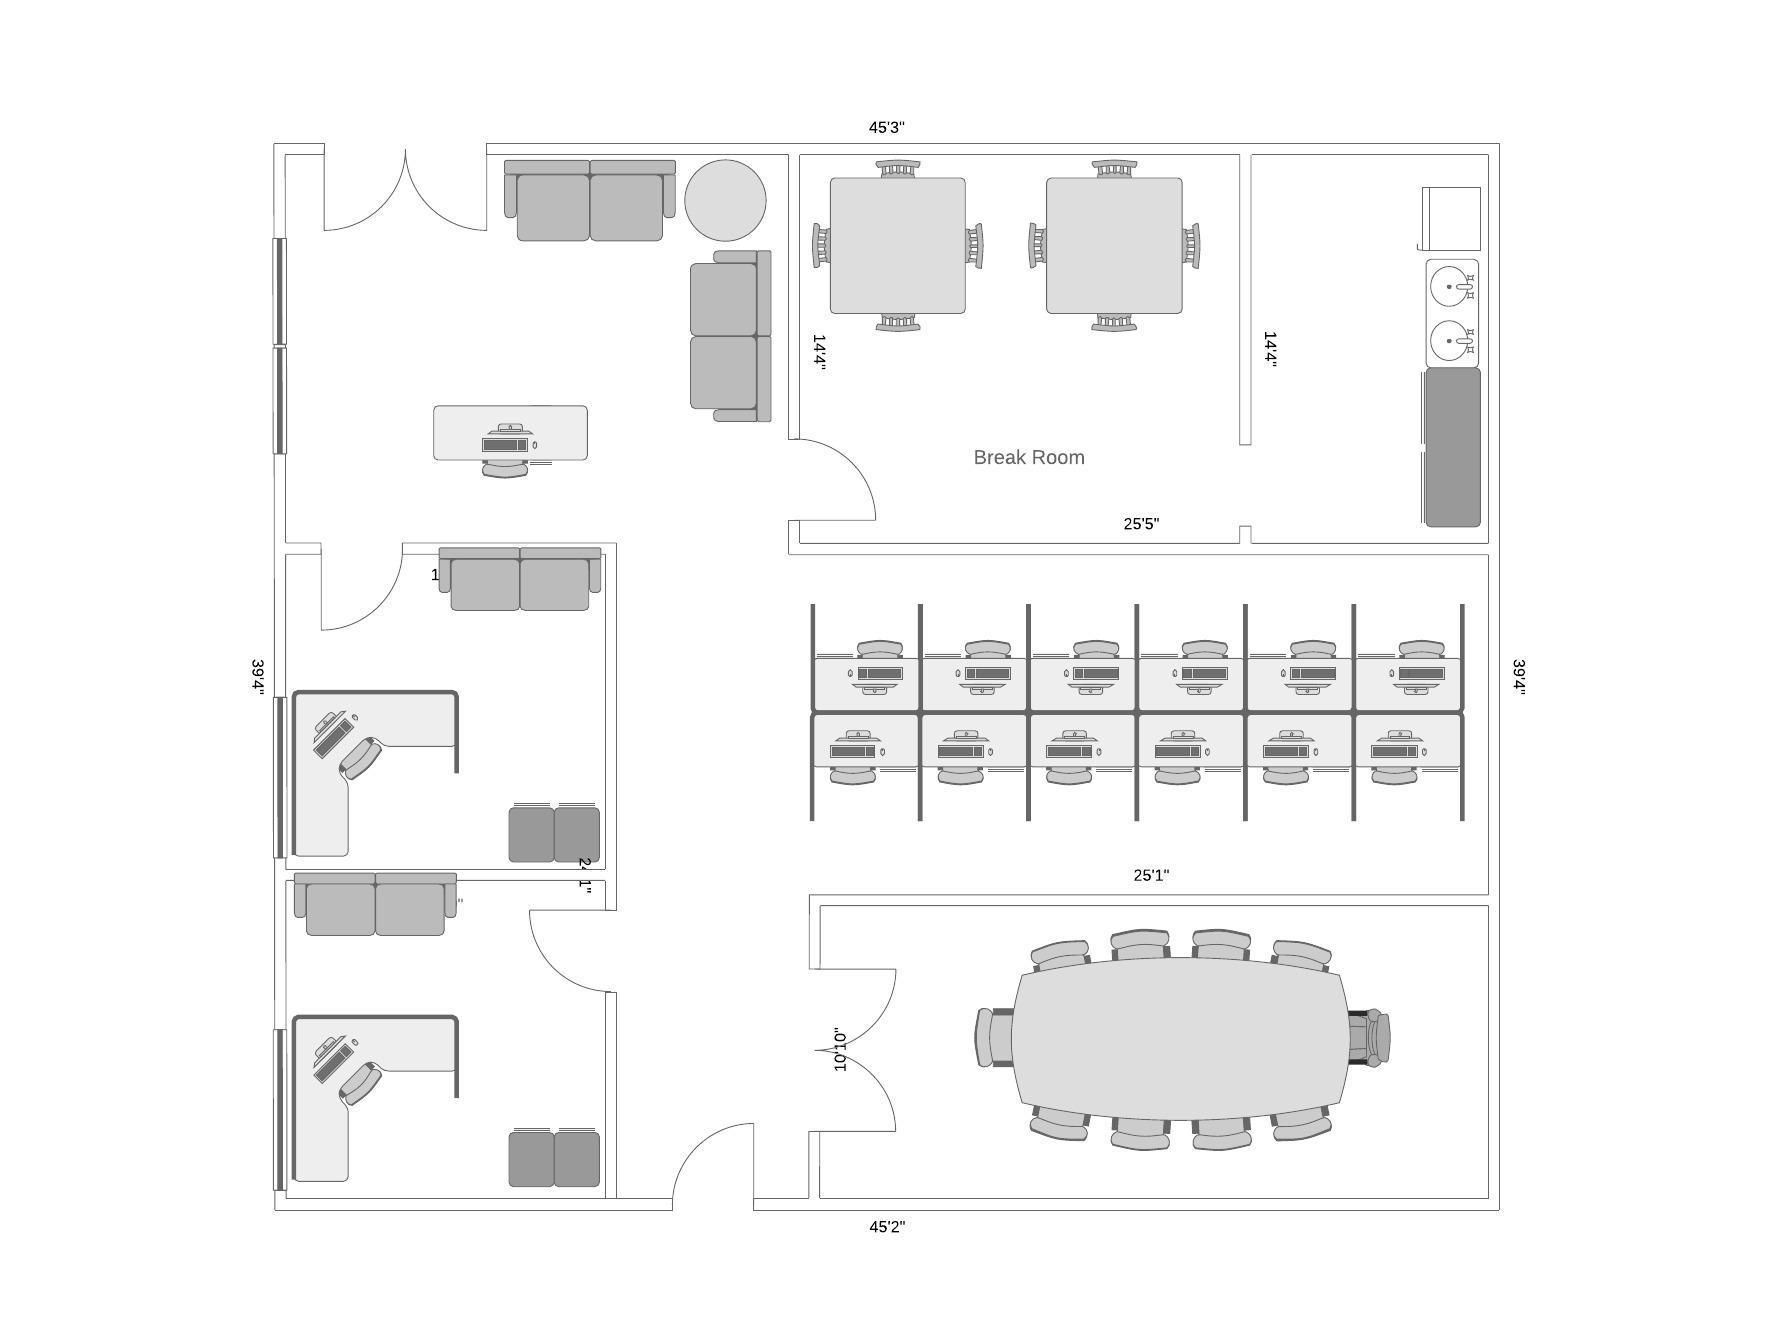 exemple de plan de niveau d'un bureau